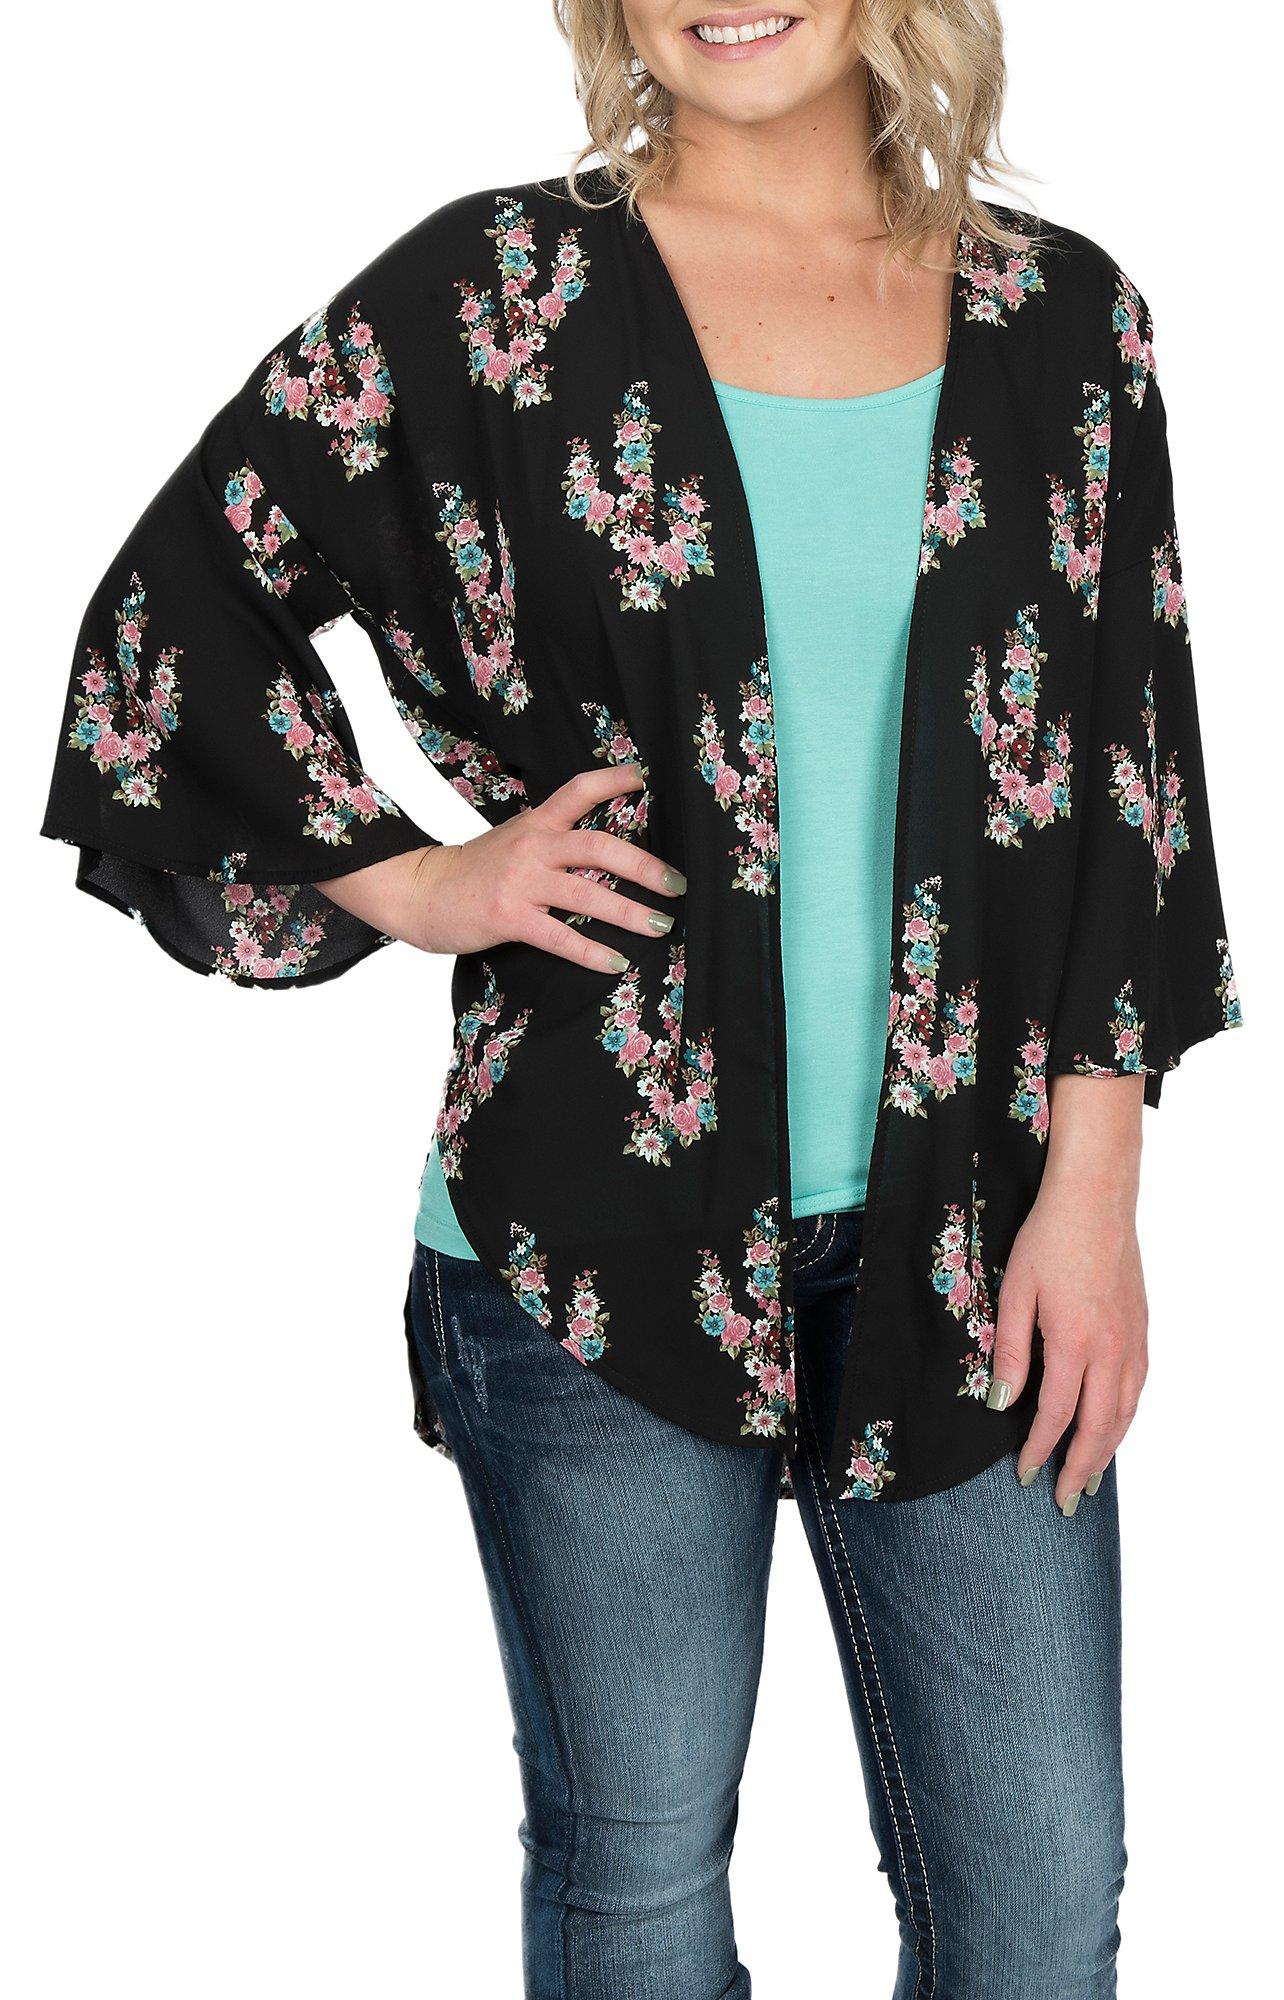 Women's Kimono Cardigans, Vests & Tops | Aztec Cardigans | Cavender's